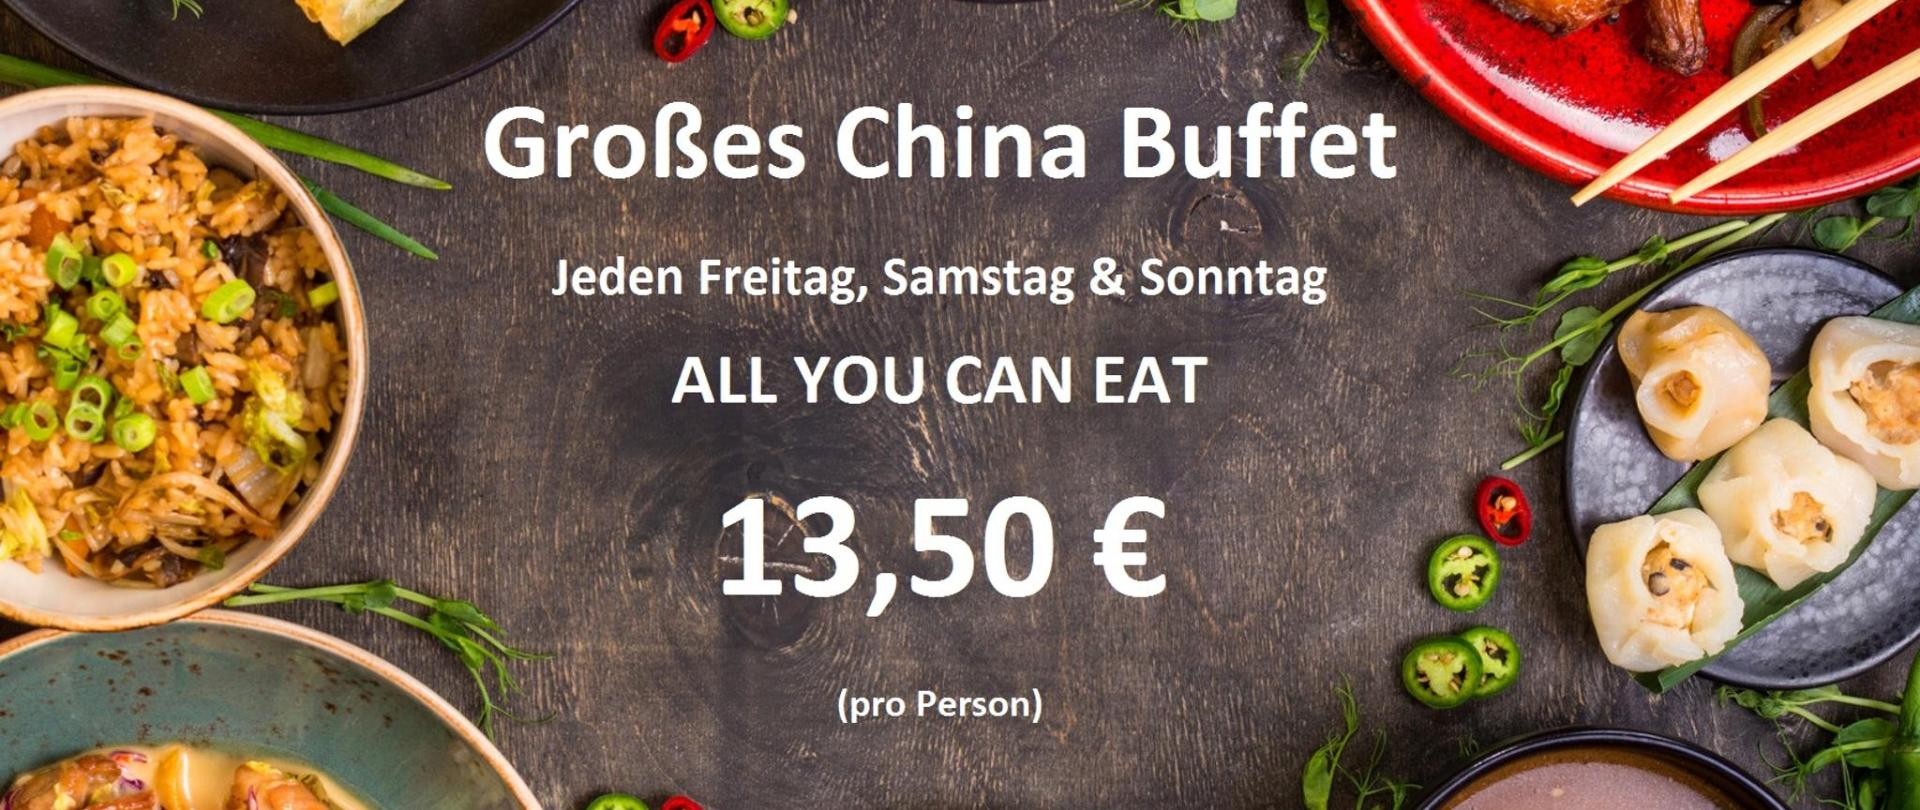 chinese-food-blank-background.jpg